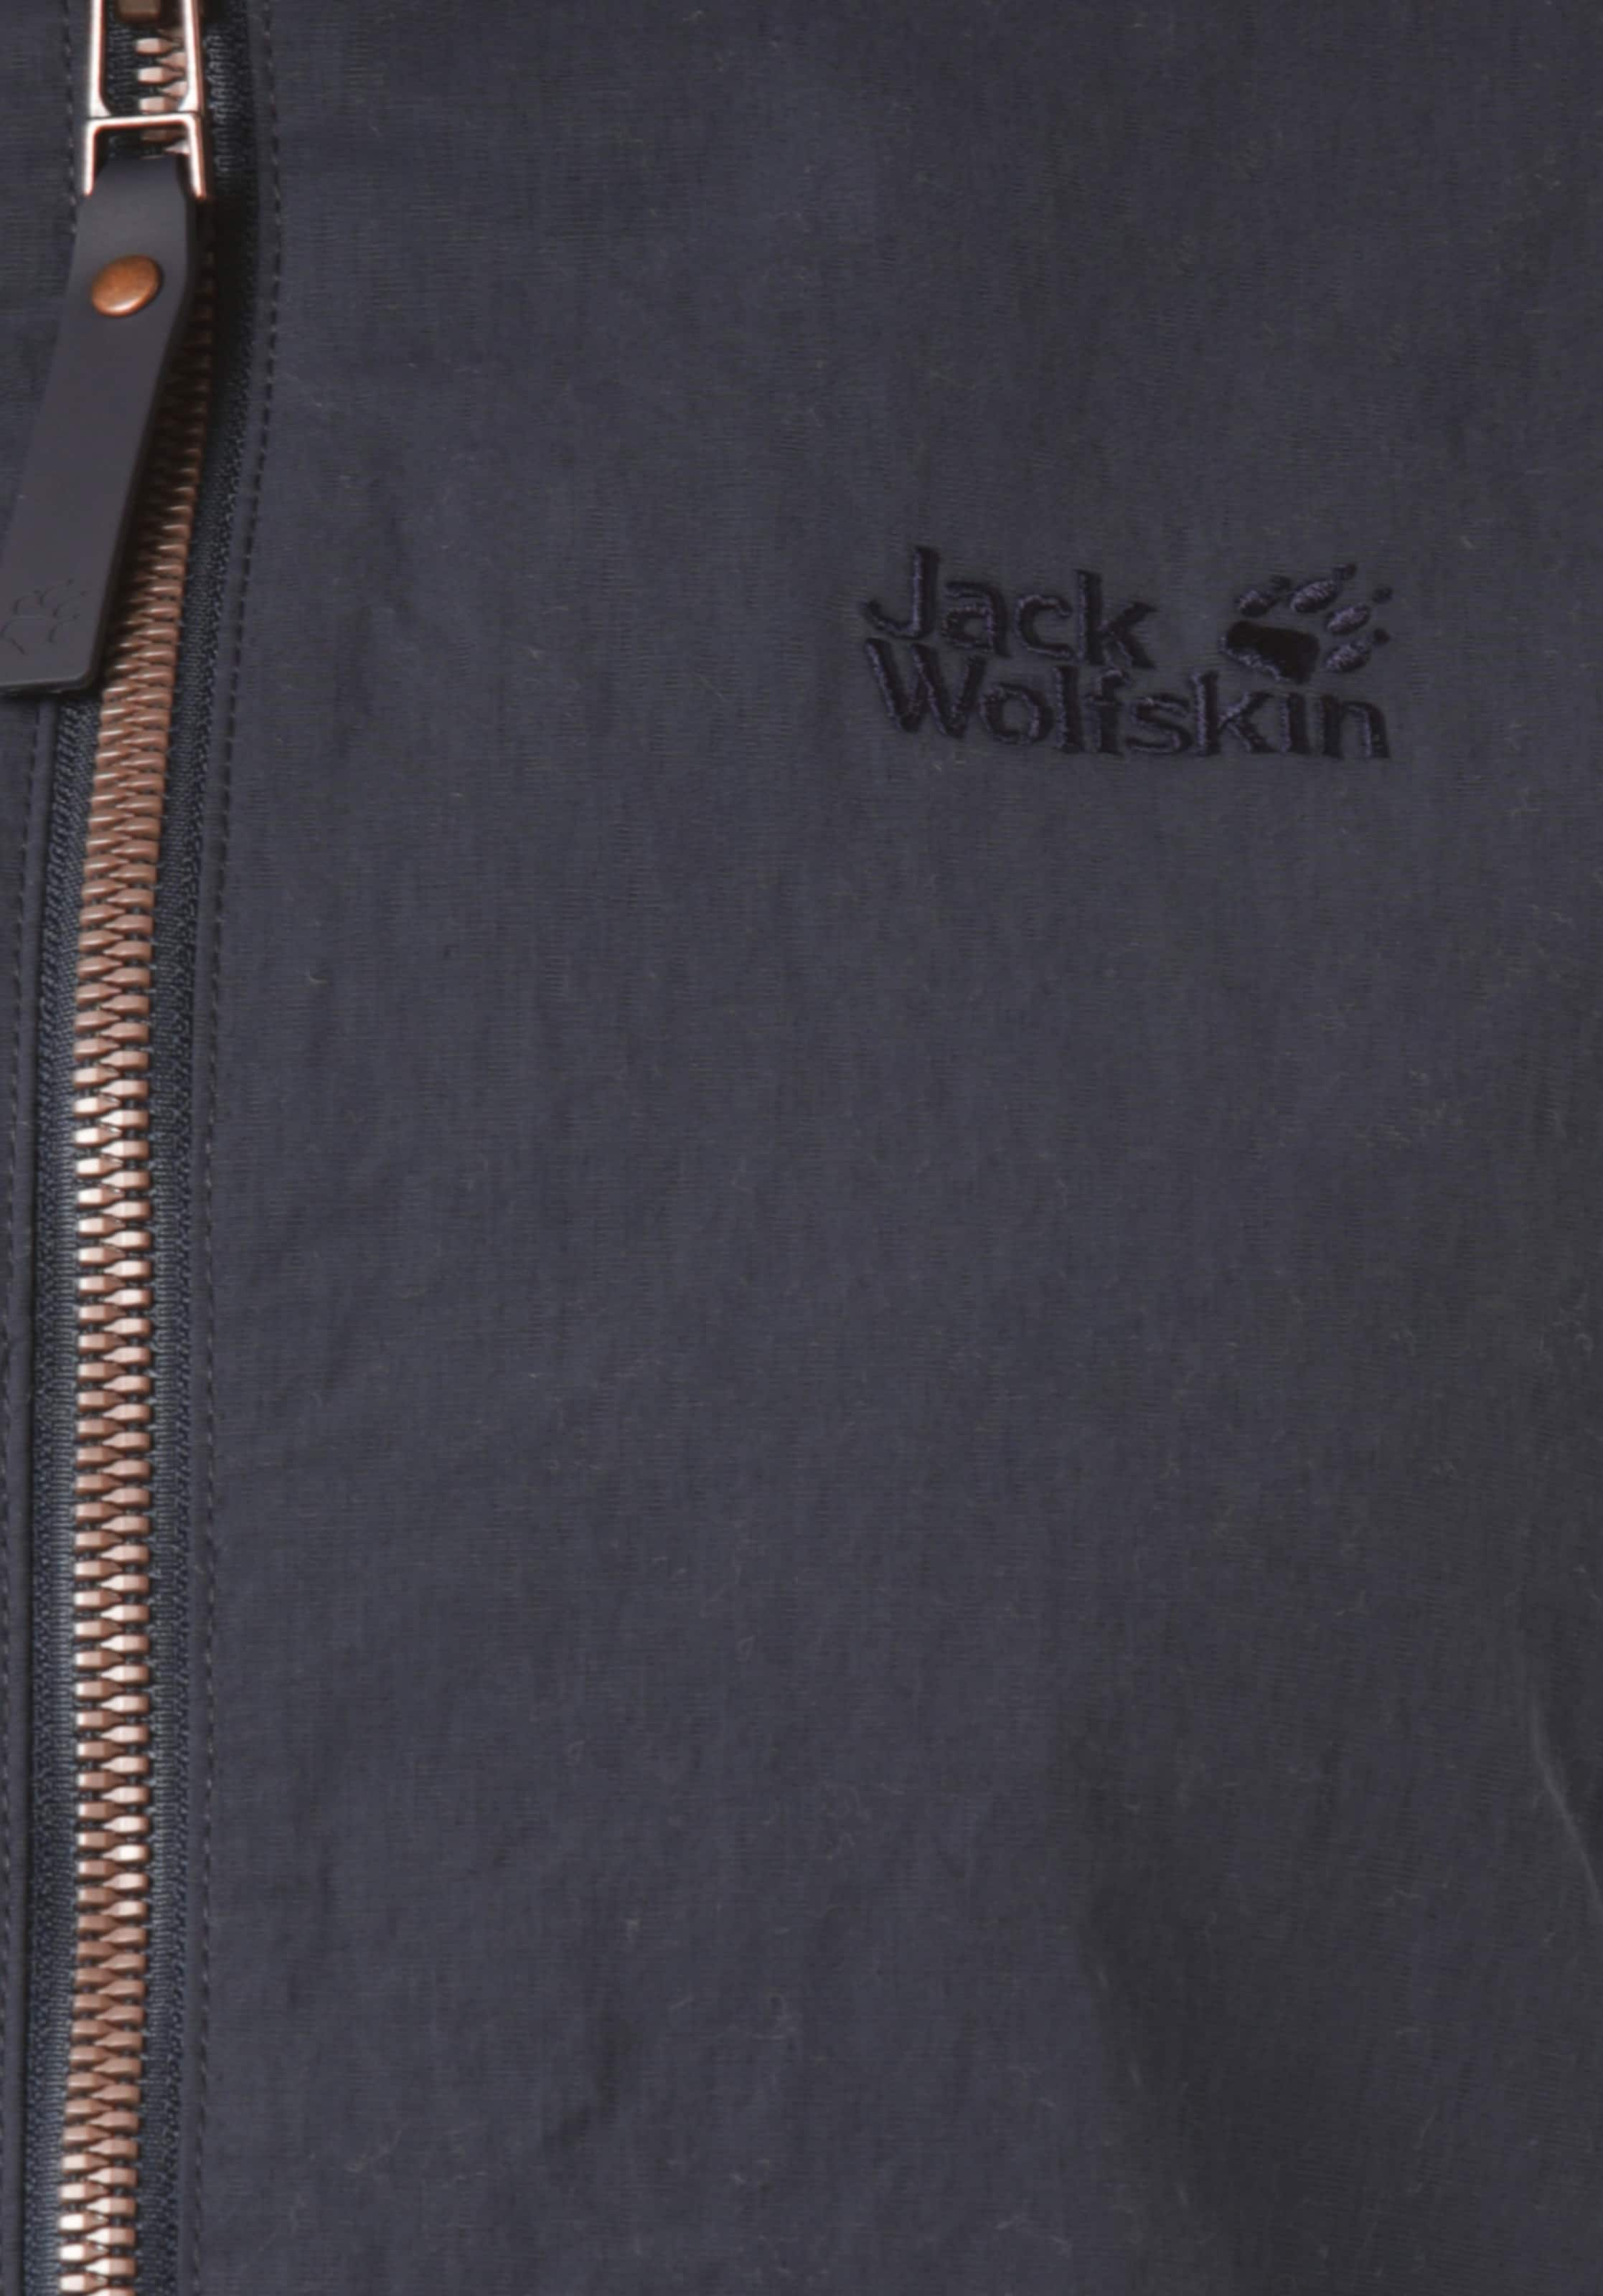 Jack Bleu En Outdoor Wolfskin 'lakeside' Veste Nuit srdthQCx